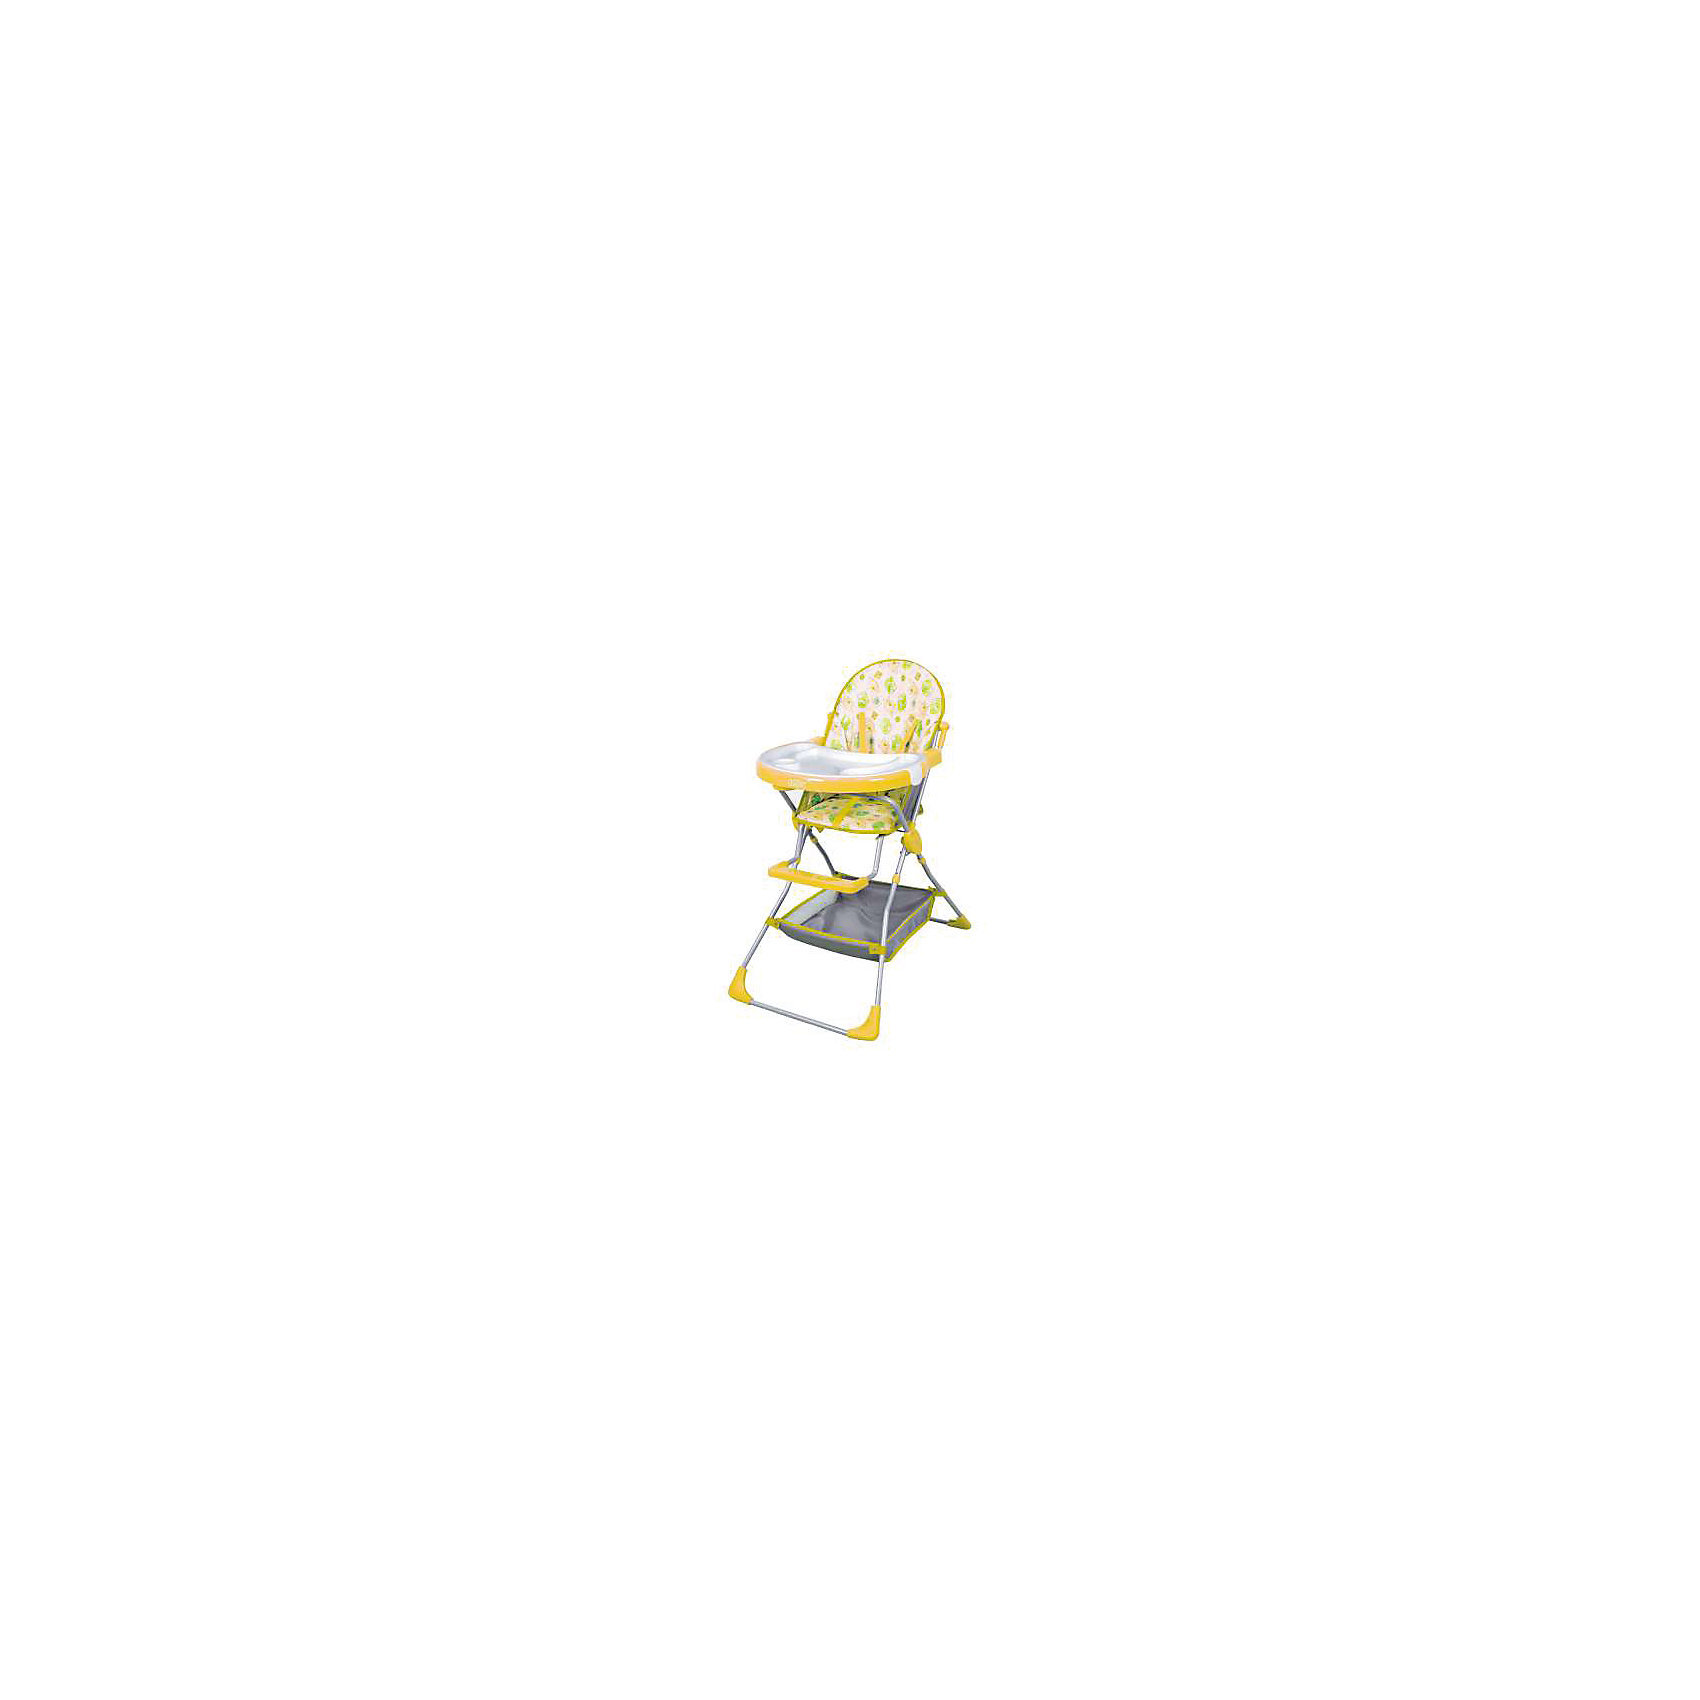 Стульчик для кормления 252 Selby, желтый